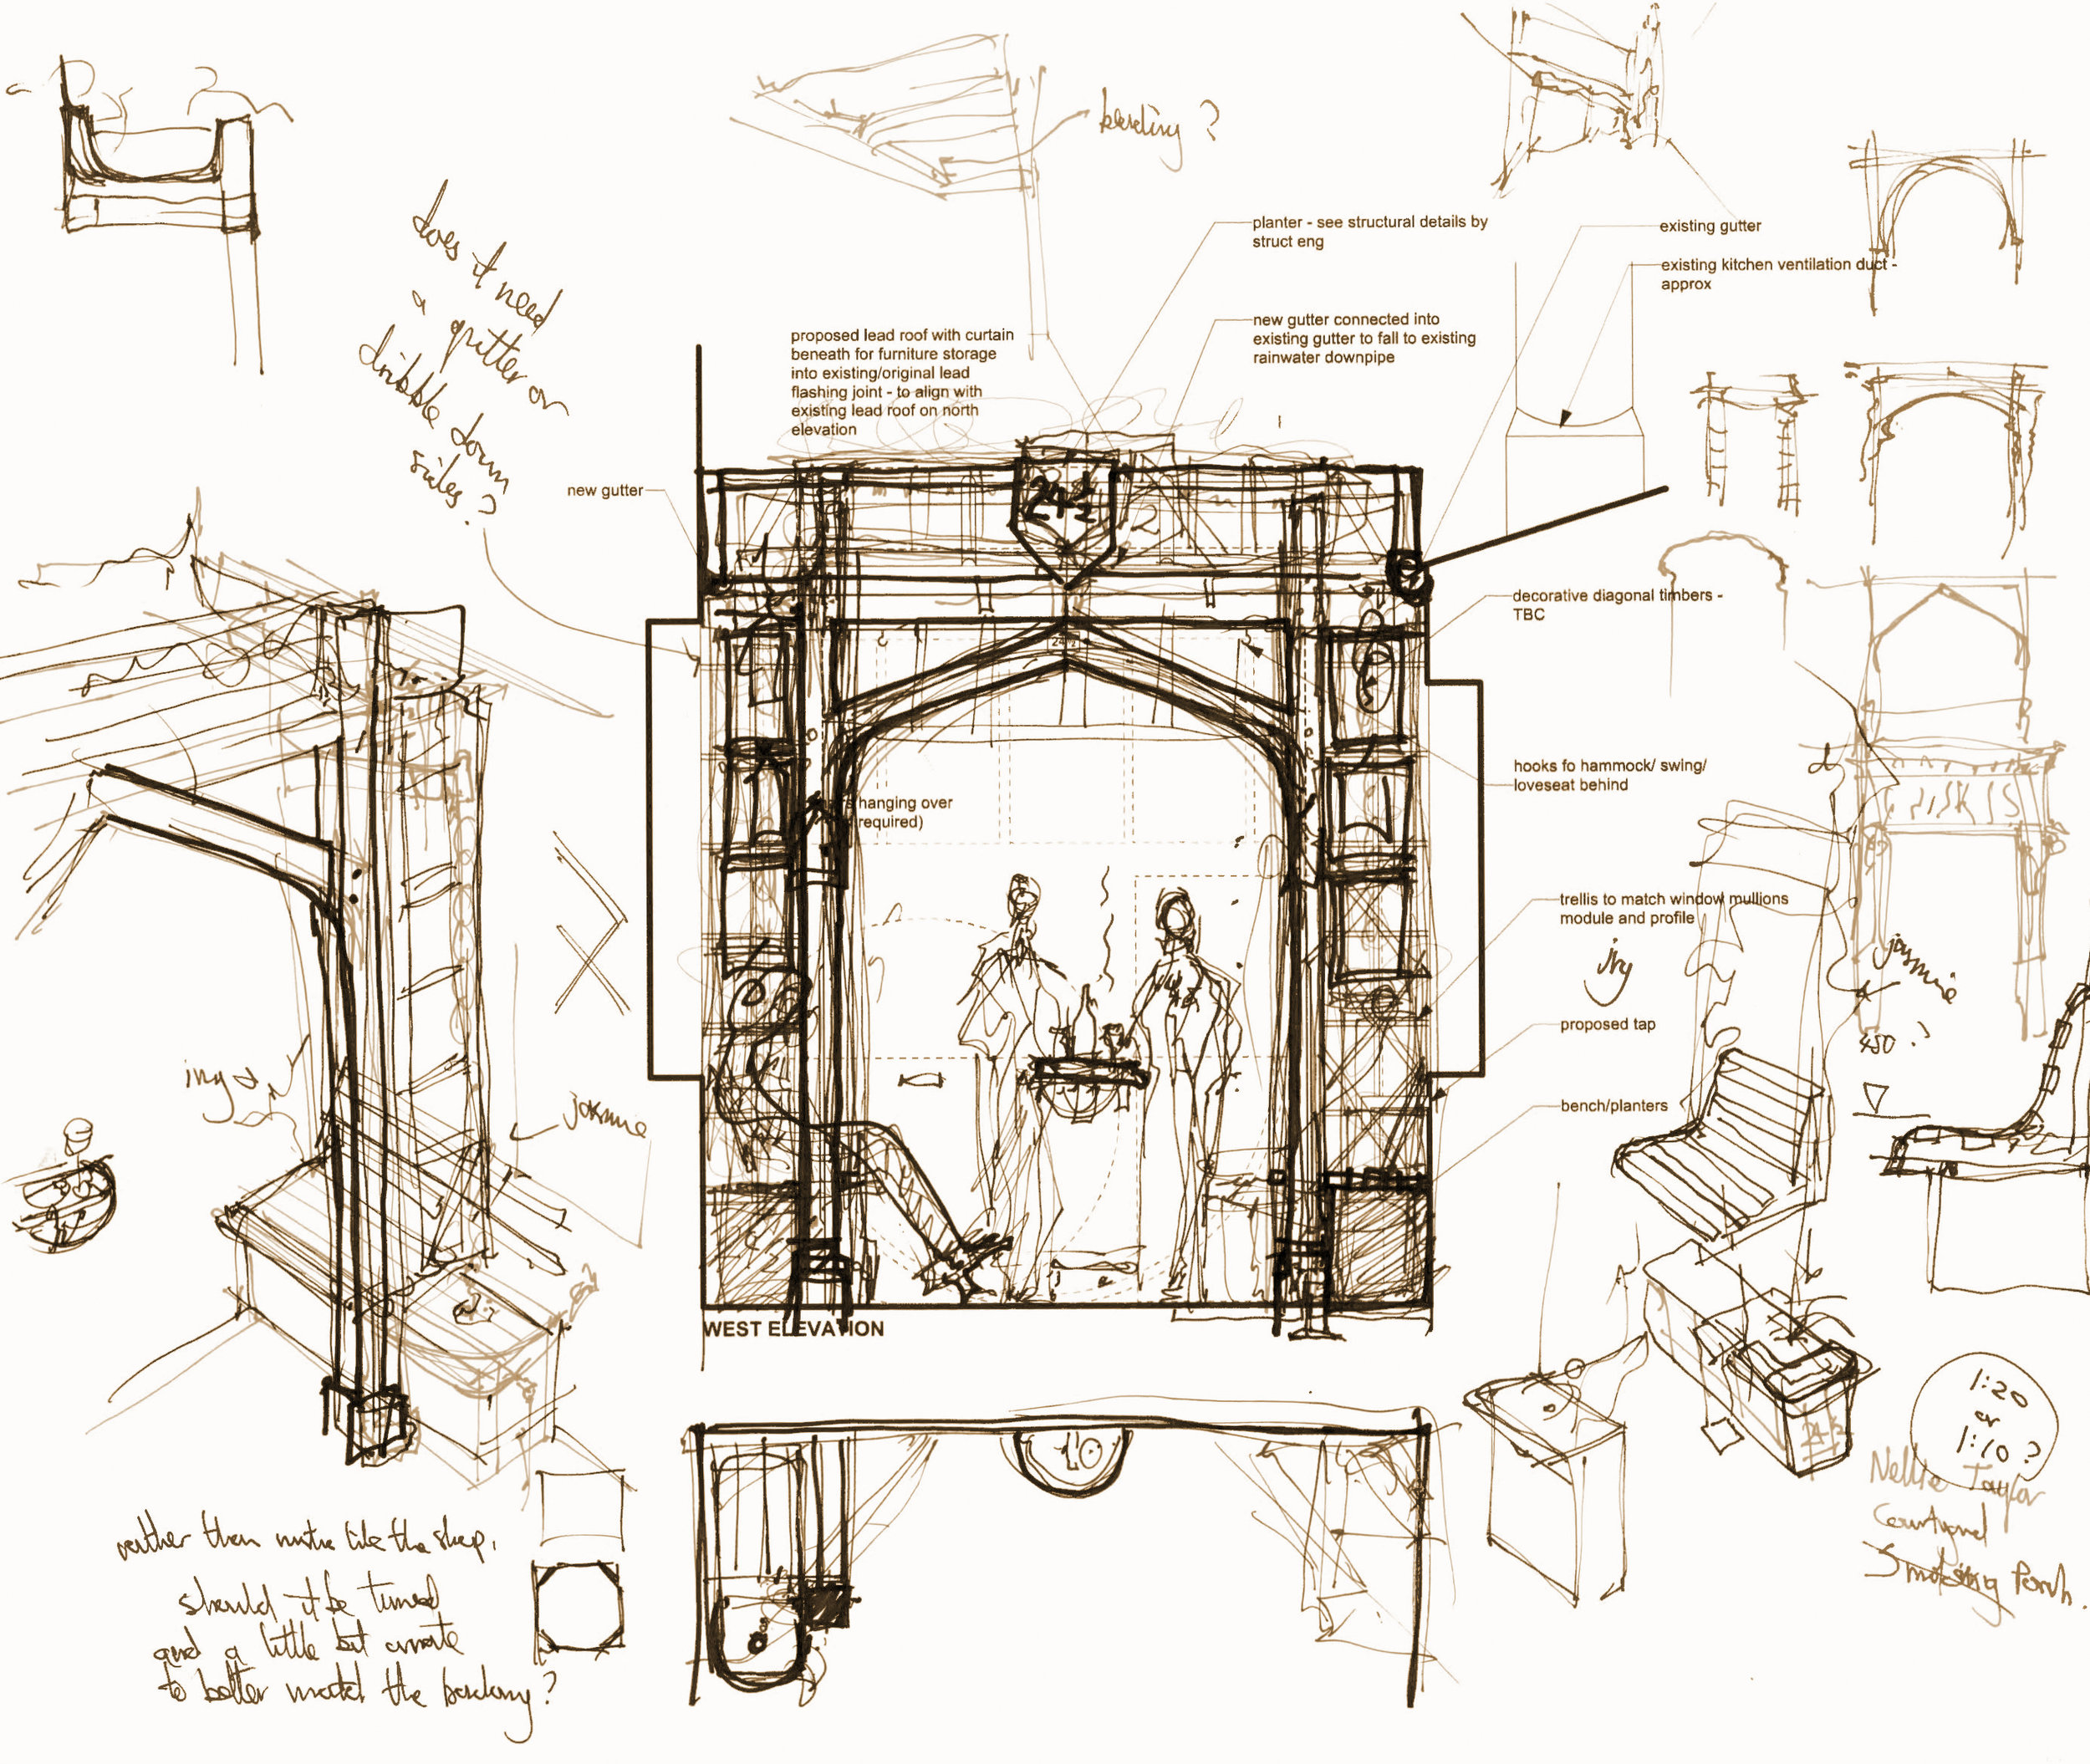 FINE architecture_BucksClub_sketch06.jpg